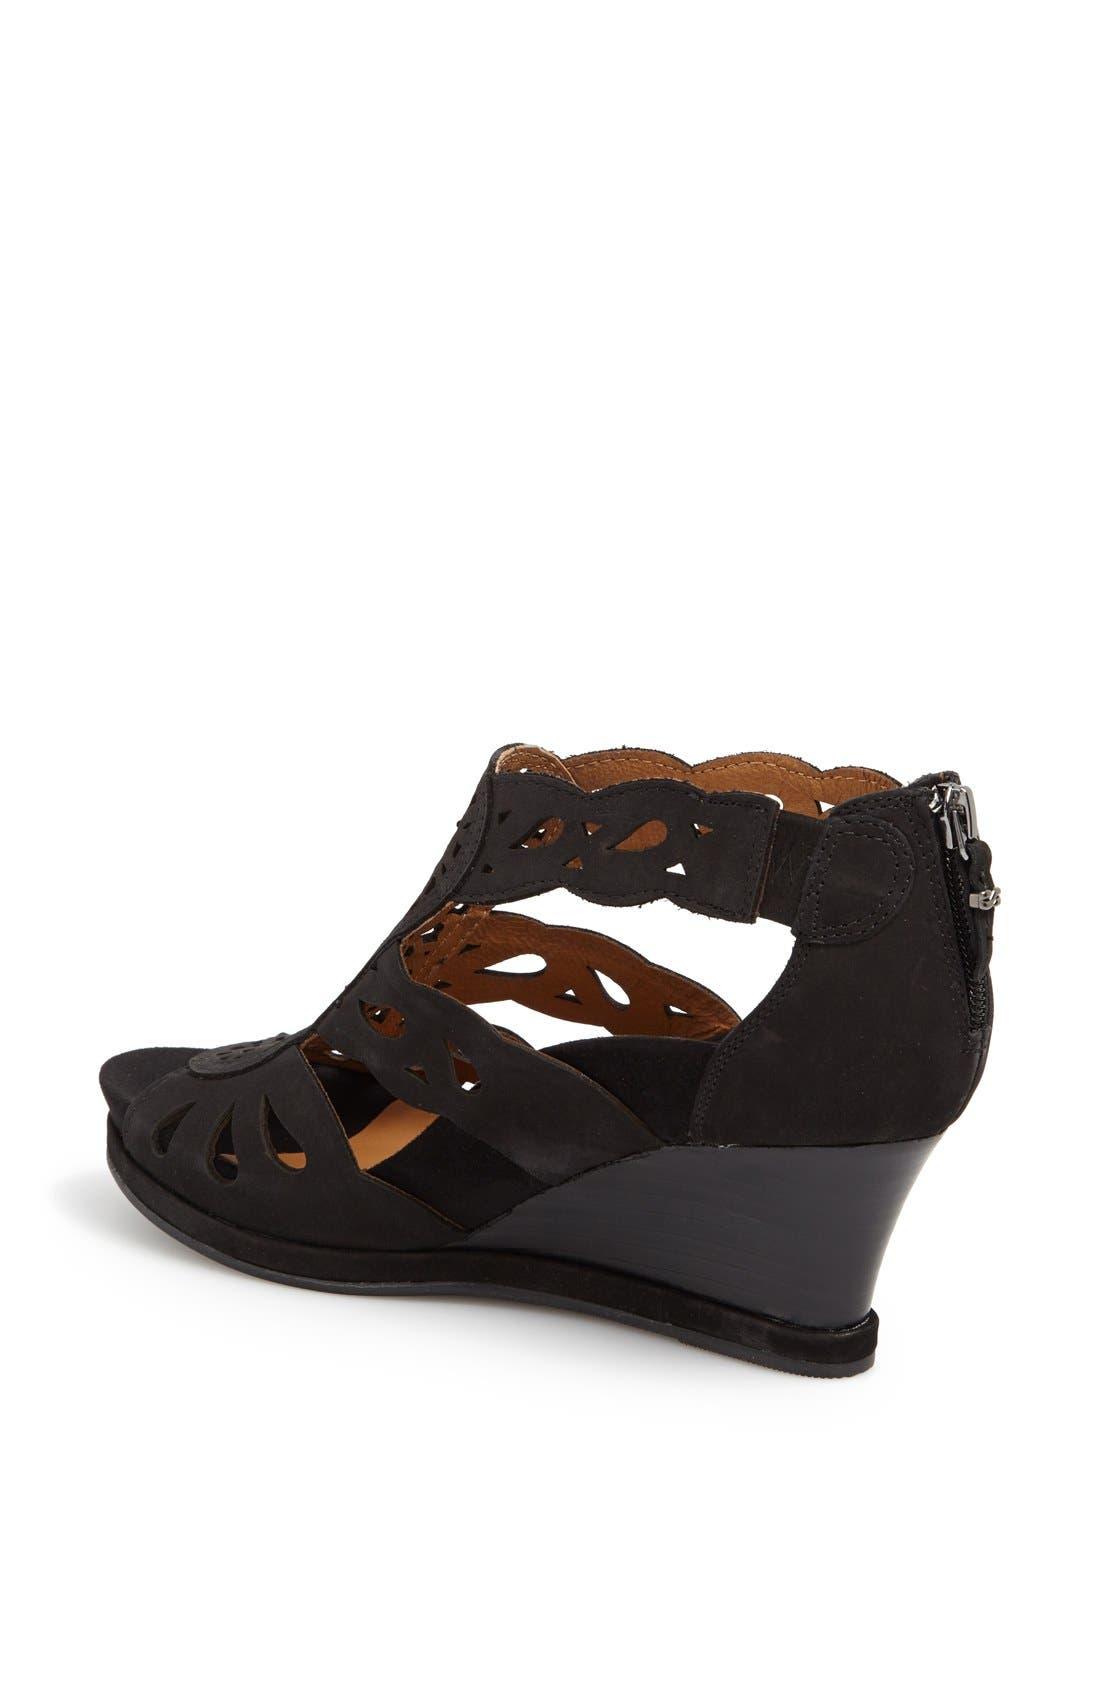 Alternate Image 2  - Earthies® 'Campora' Wedge Sandal